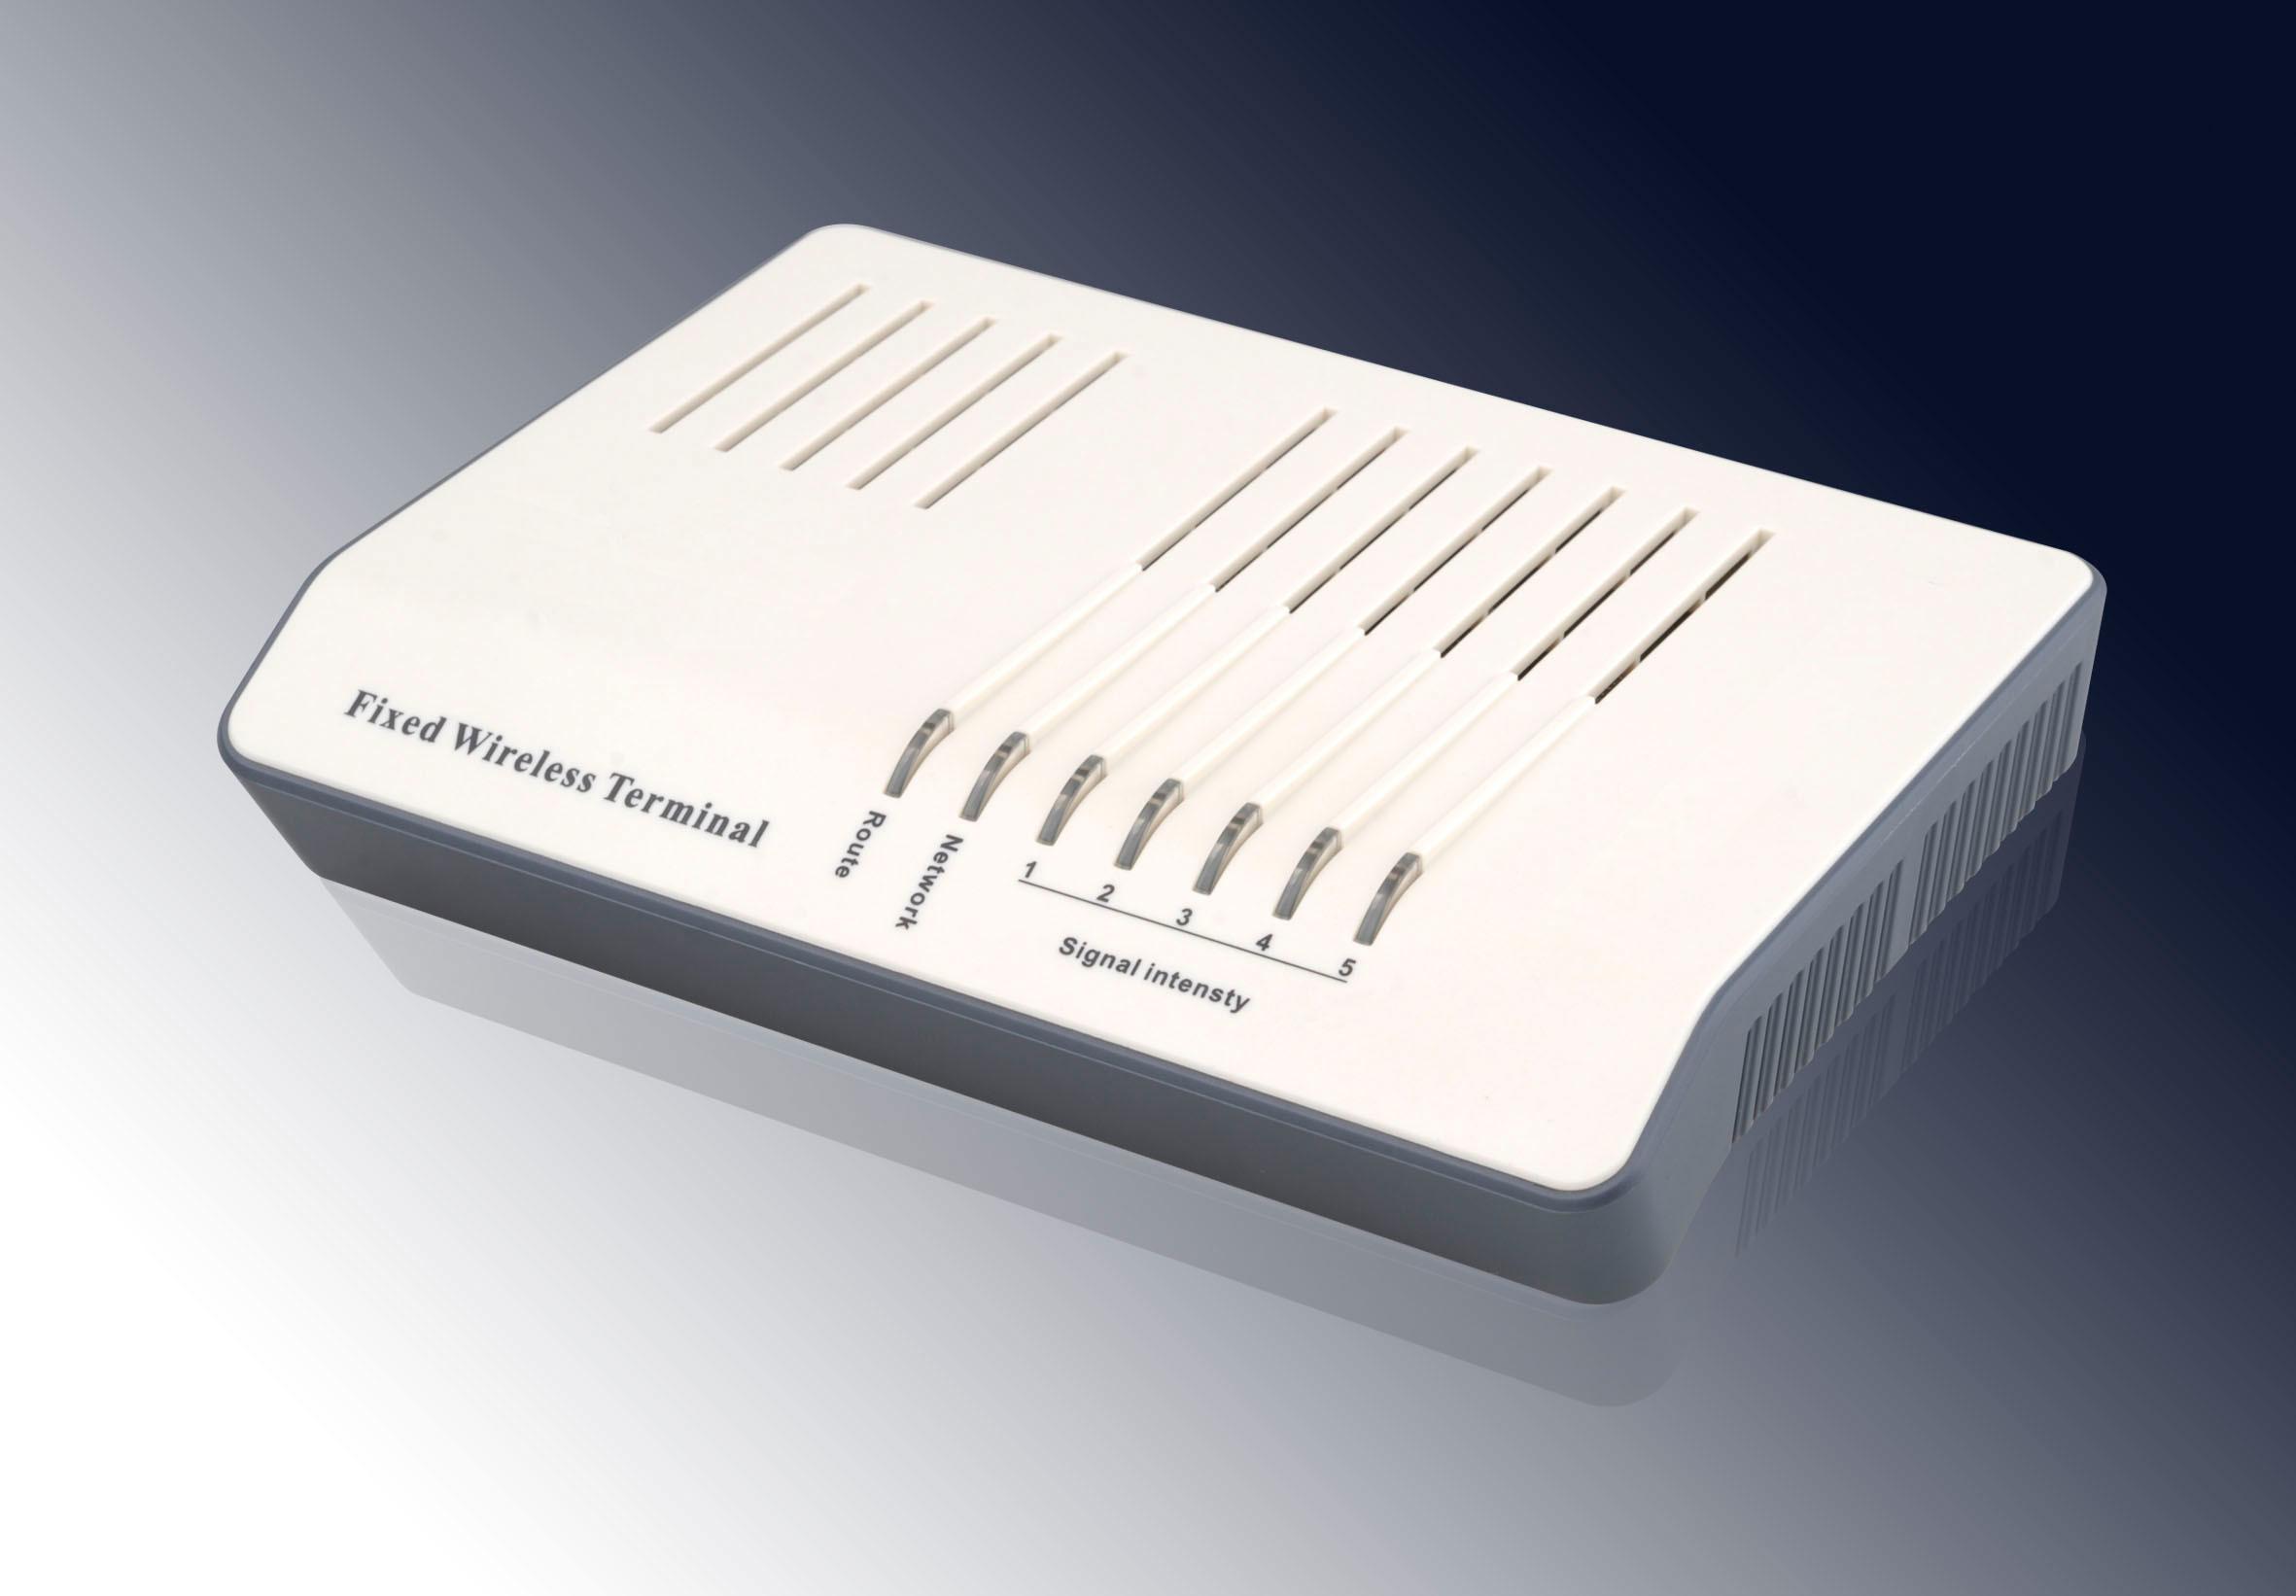 GSM calling transfer terminal (GSM-TIT608)